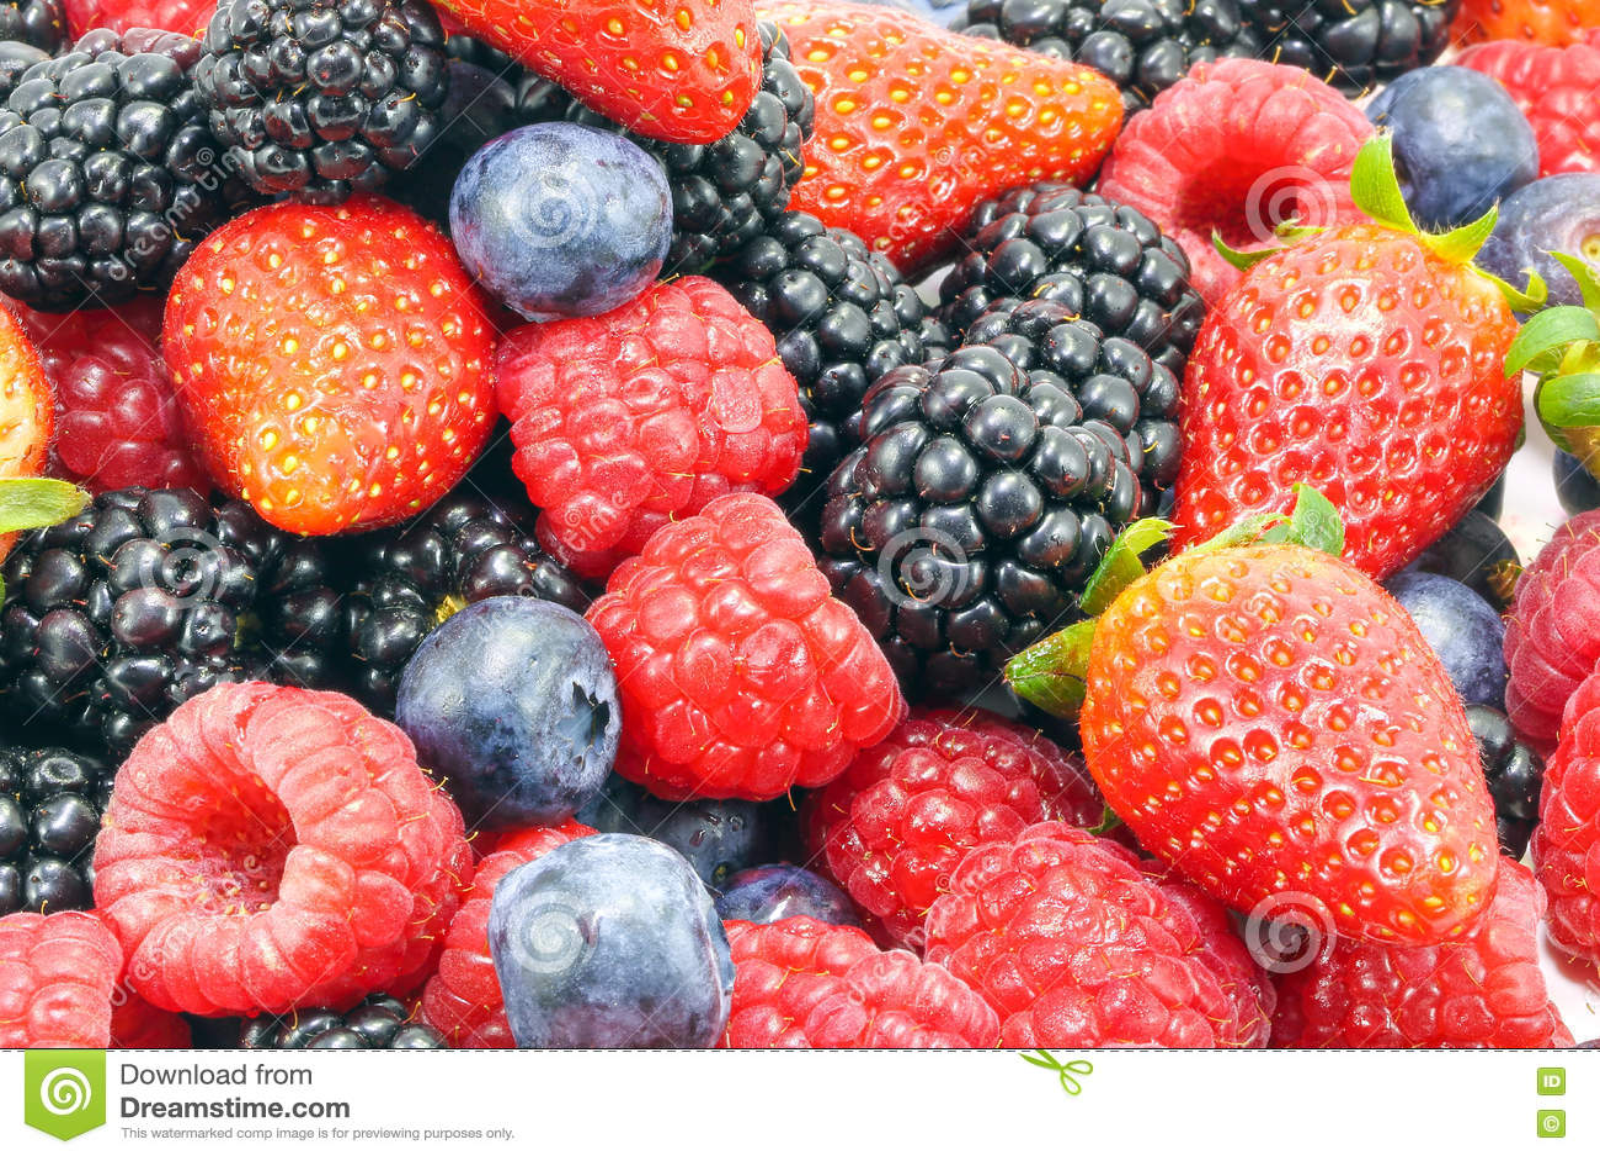 Fruit Strawberry/Blueberry